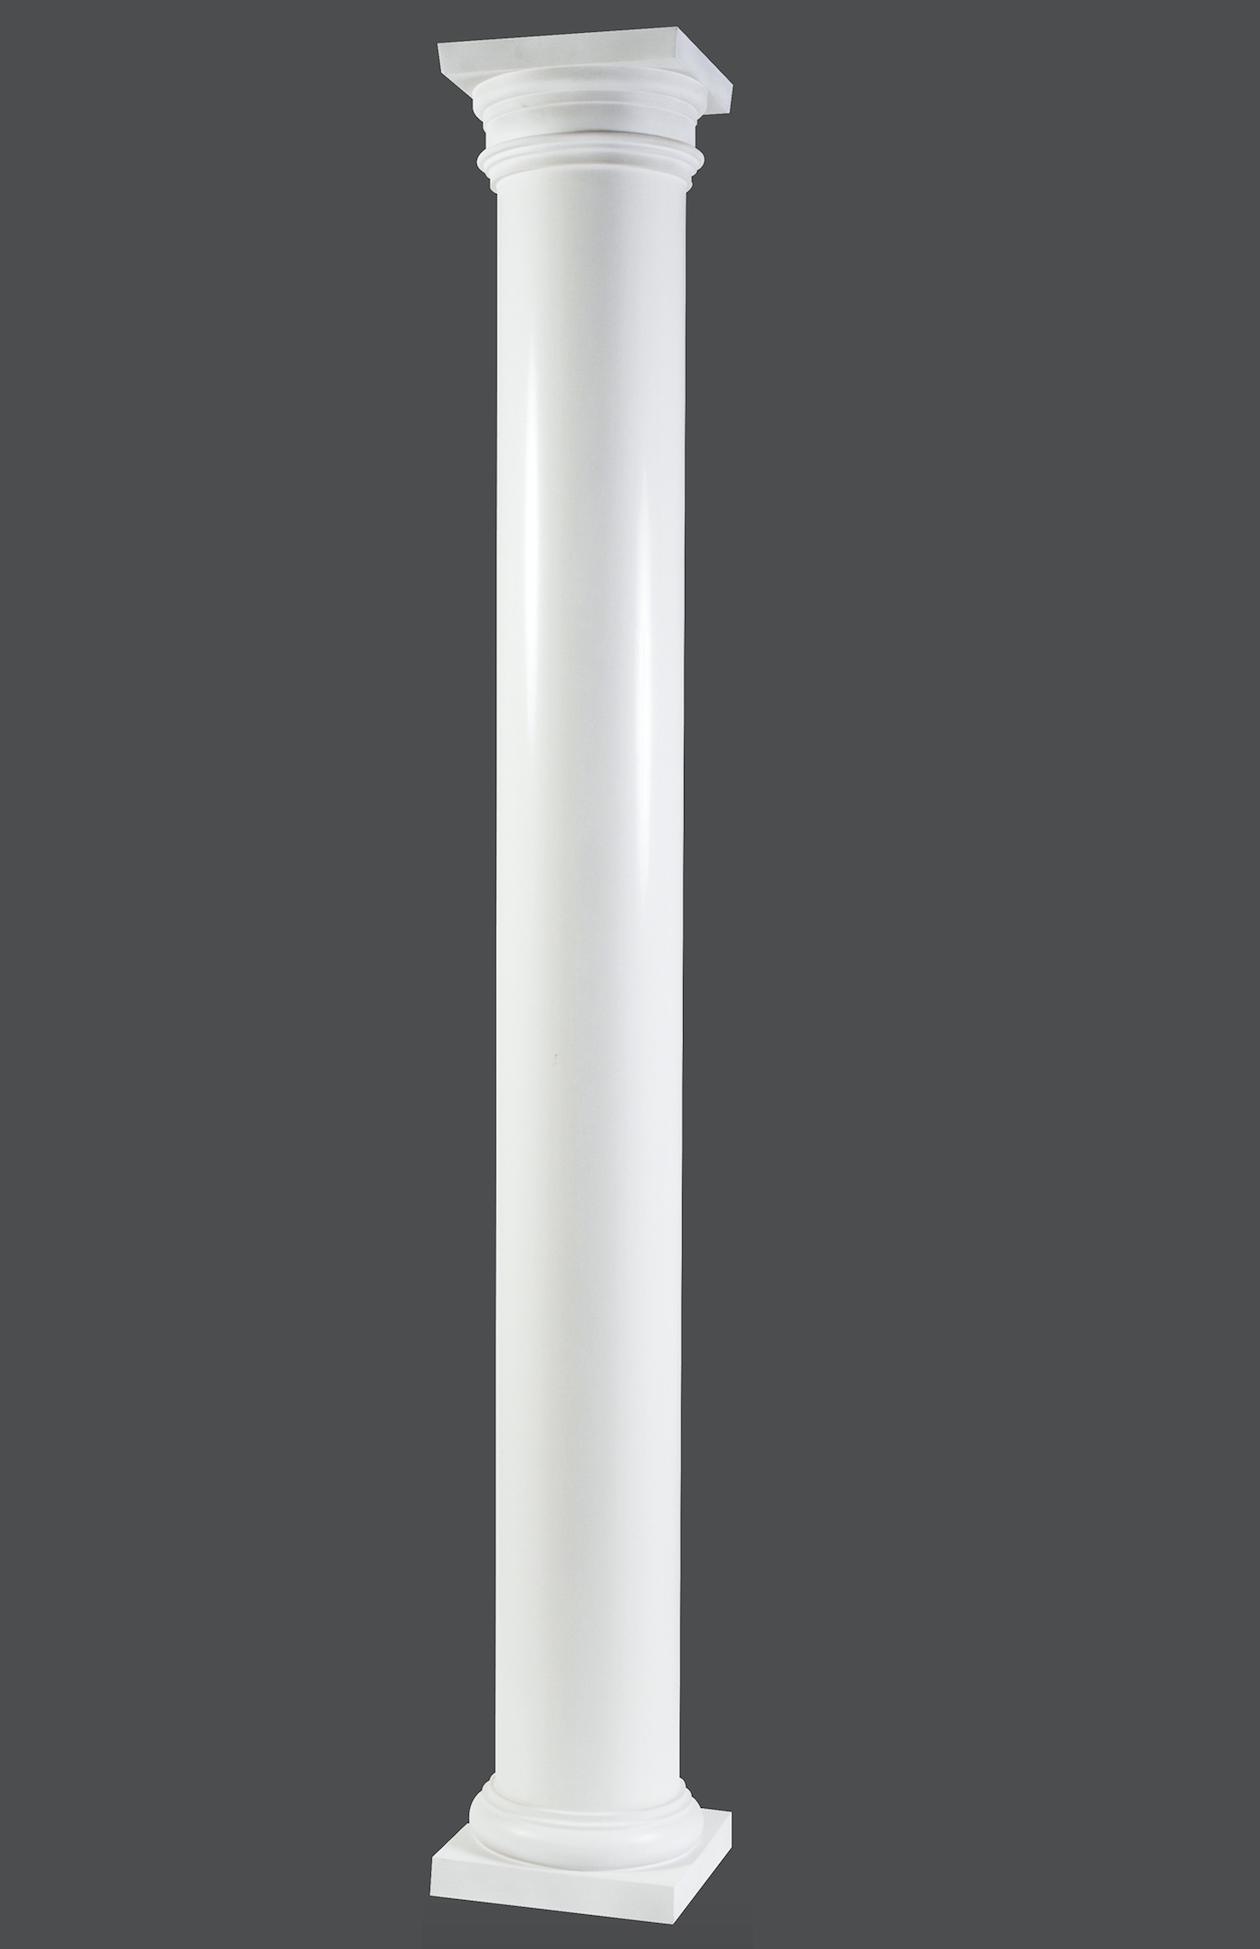 Capital Columns Trim Exterior Column Installation Toronto Gta Fiberglass Columns Fluted Columns Column